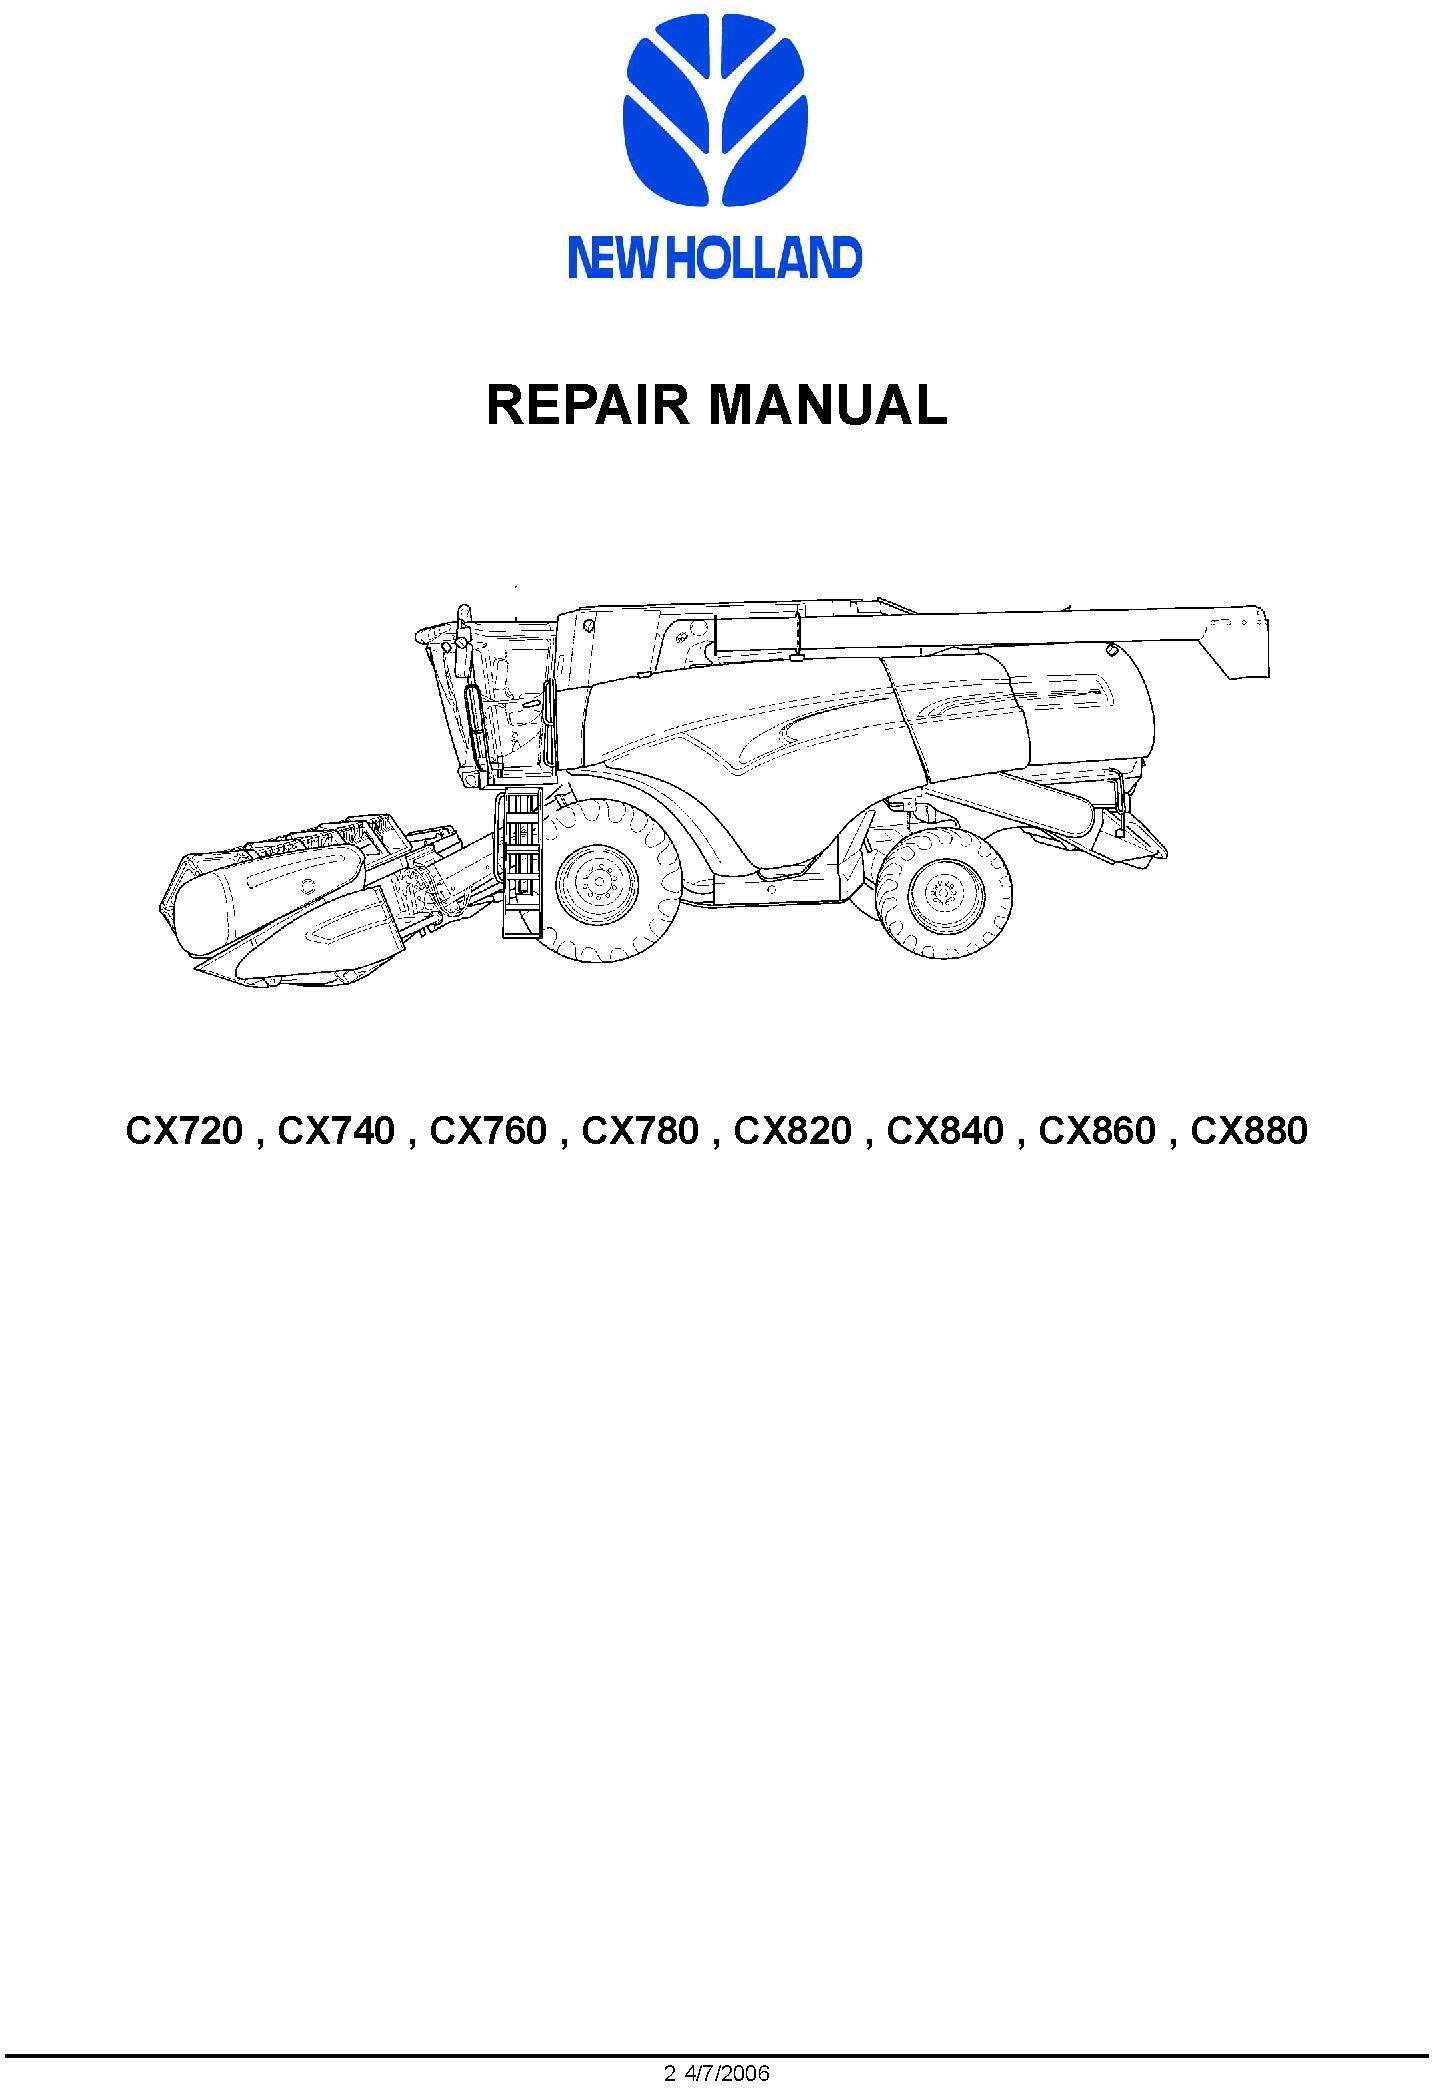 New Holland CX720, CX740, CX760, CX780, CX820, C840, CX860, CX880 Combine Service Manual - 1